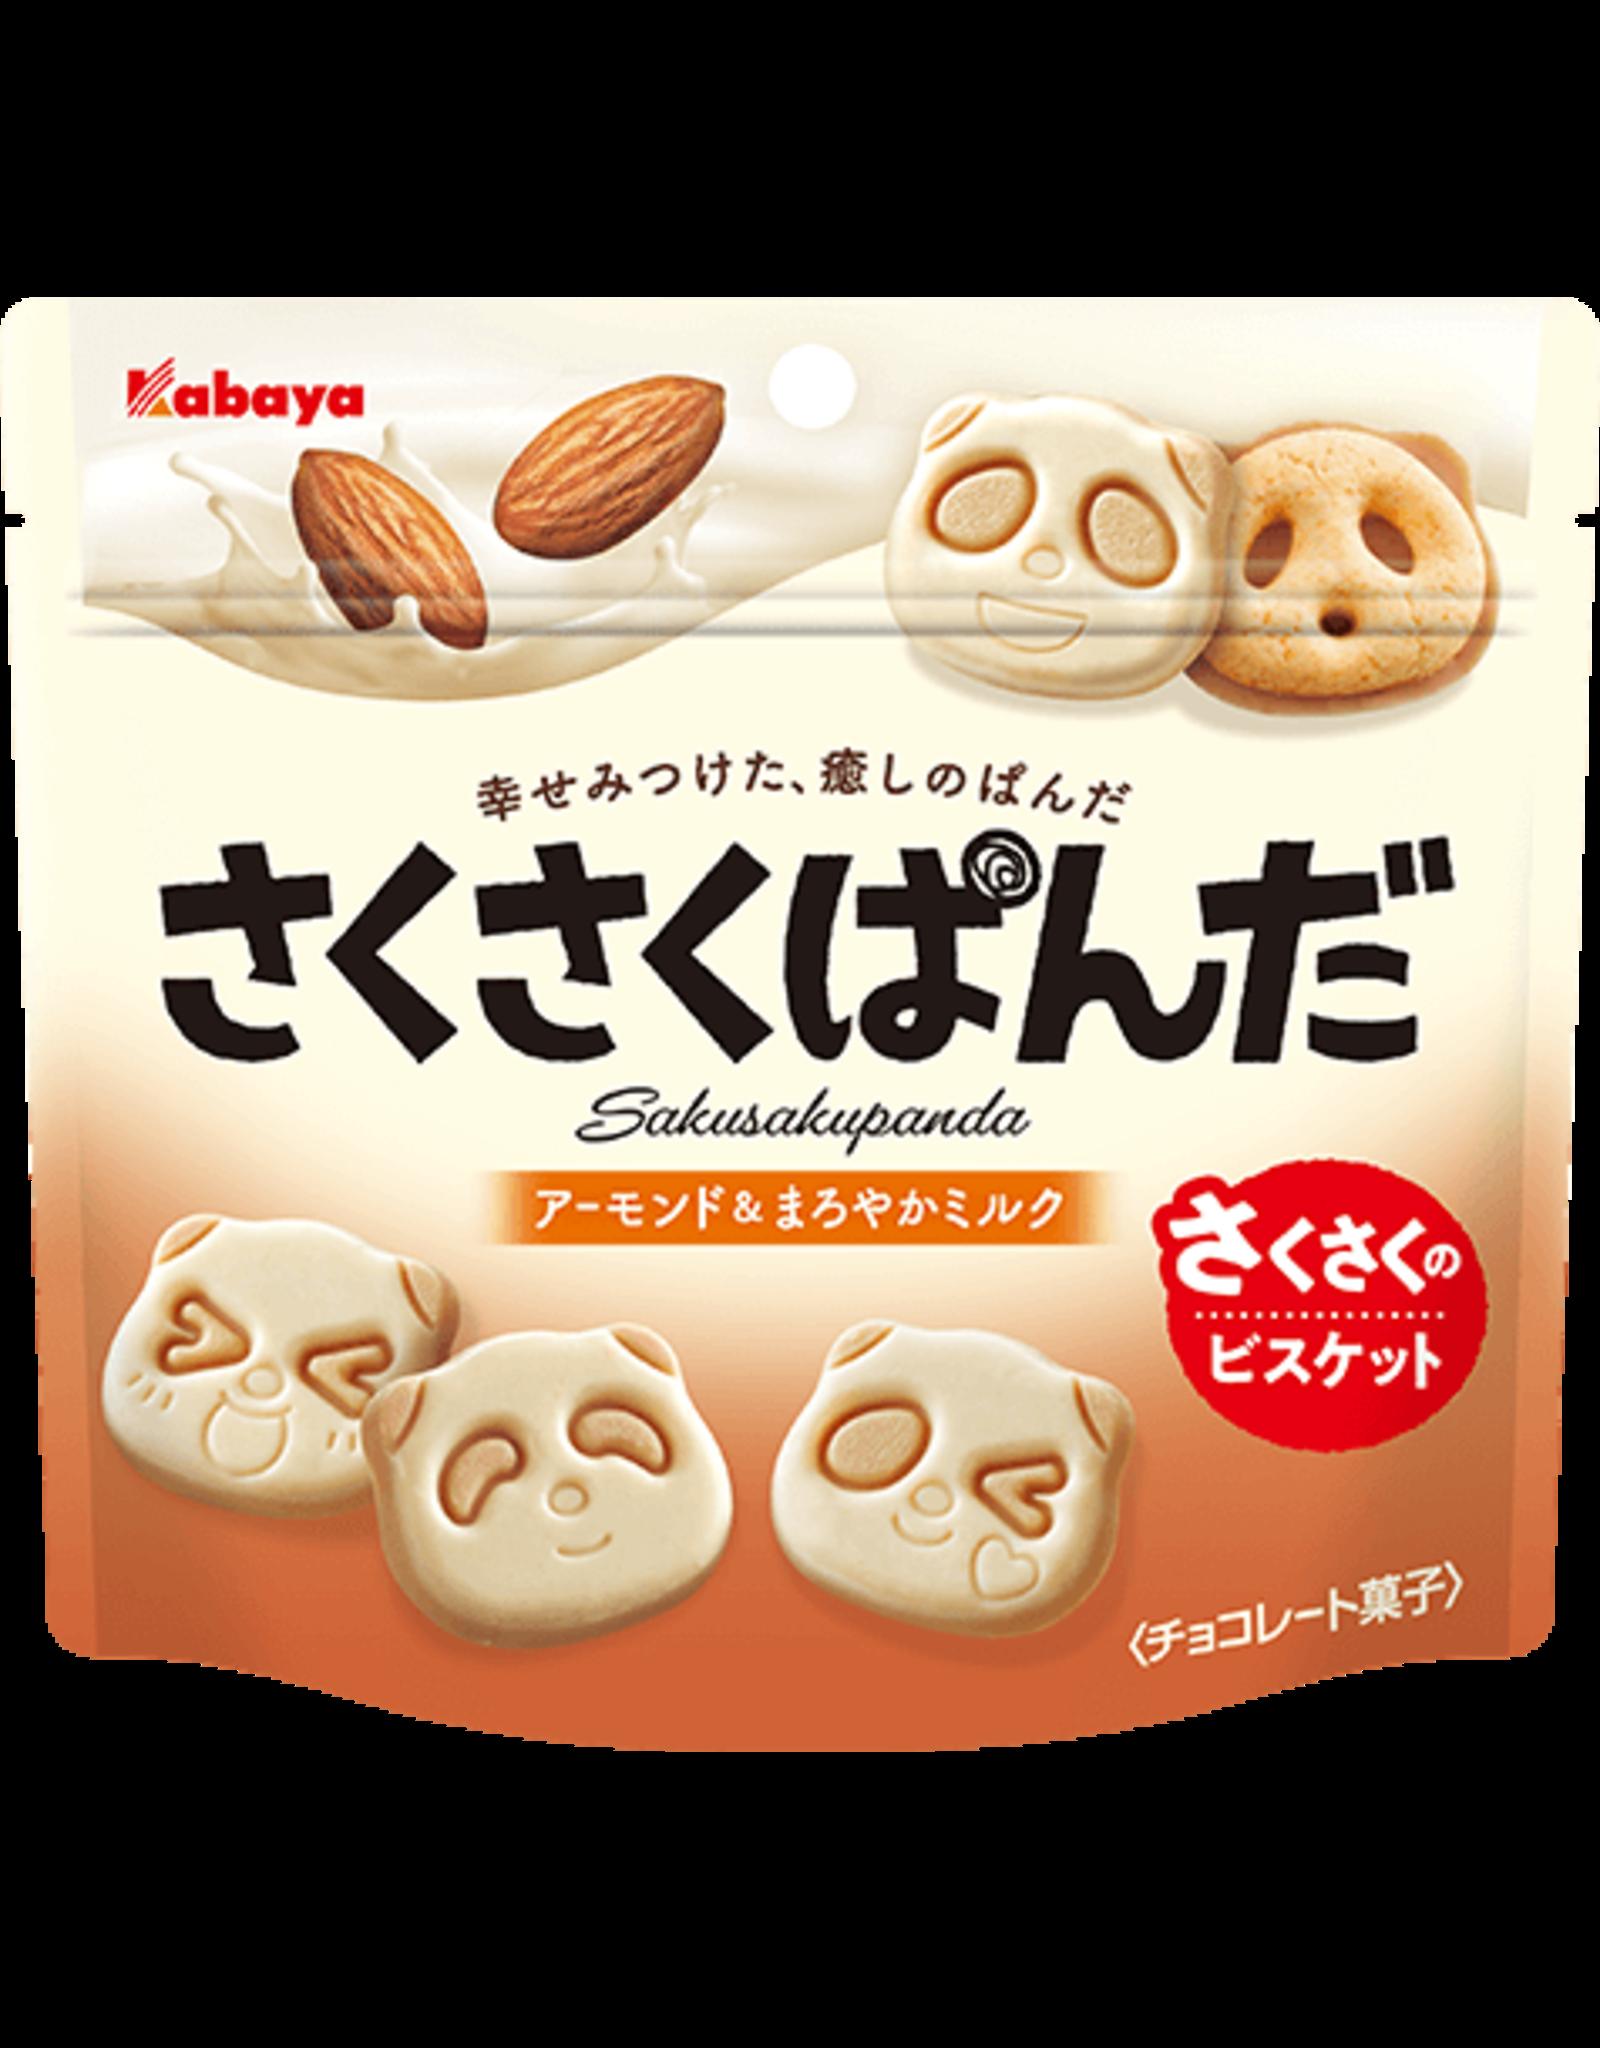 Sakusaku panda Almond Milk Cookies - 47g